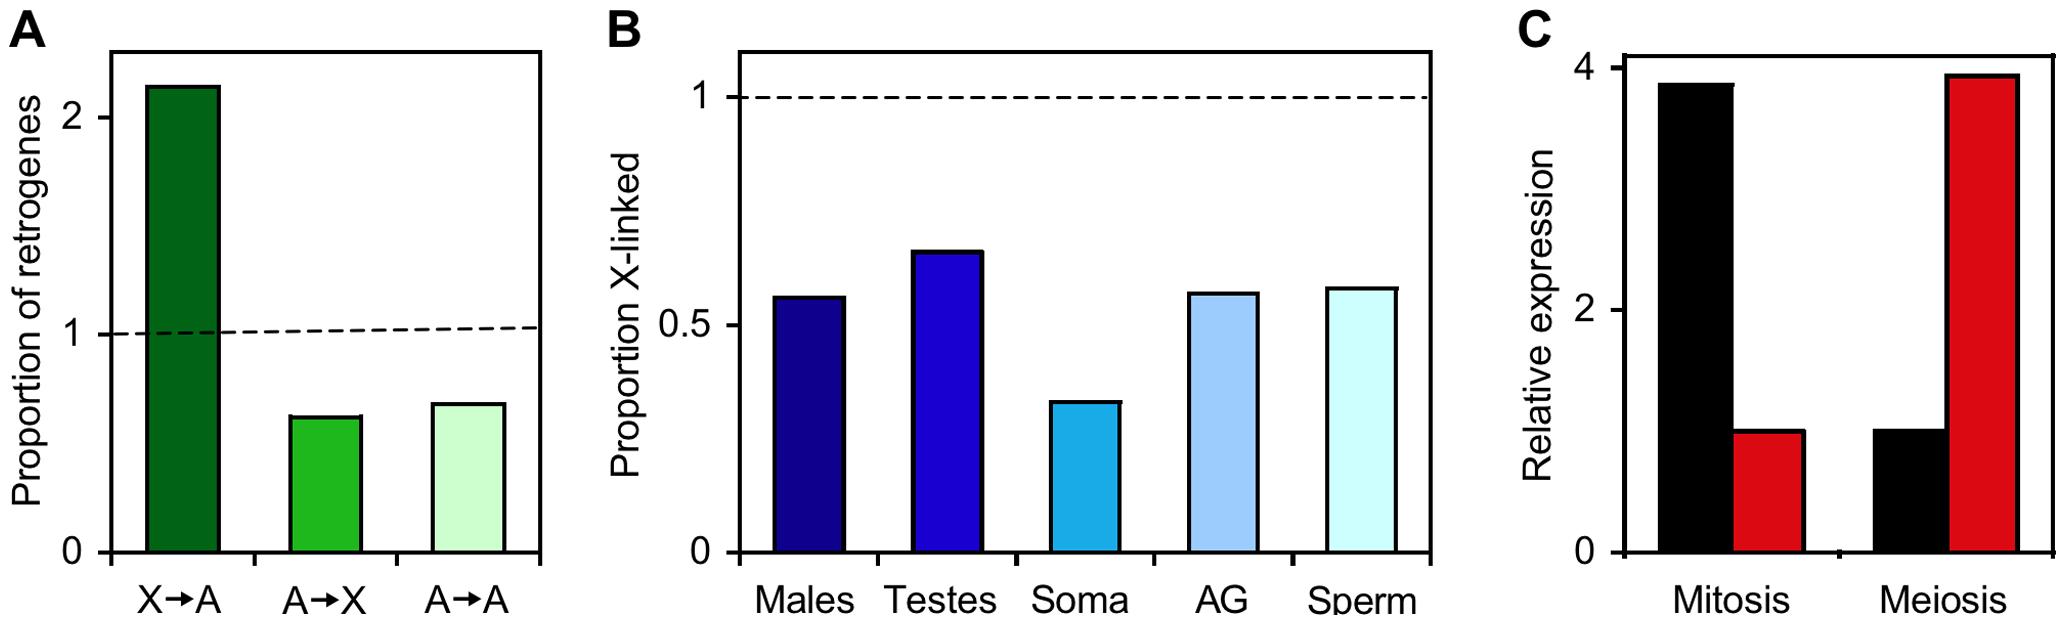 The X chromosome and autosomes of <i>Drosophila melanogaster</i> differ in retrogene and male-biased gene content.